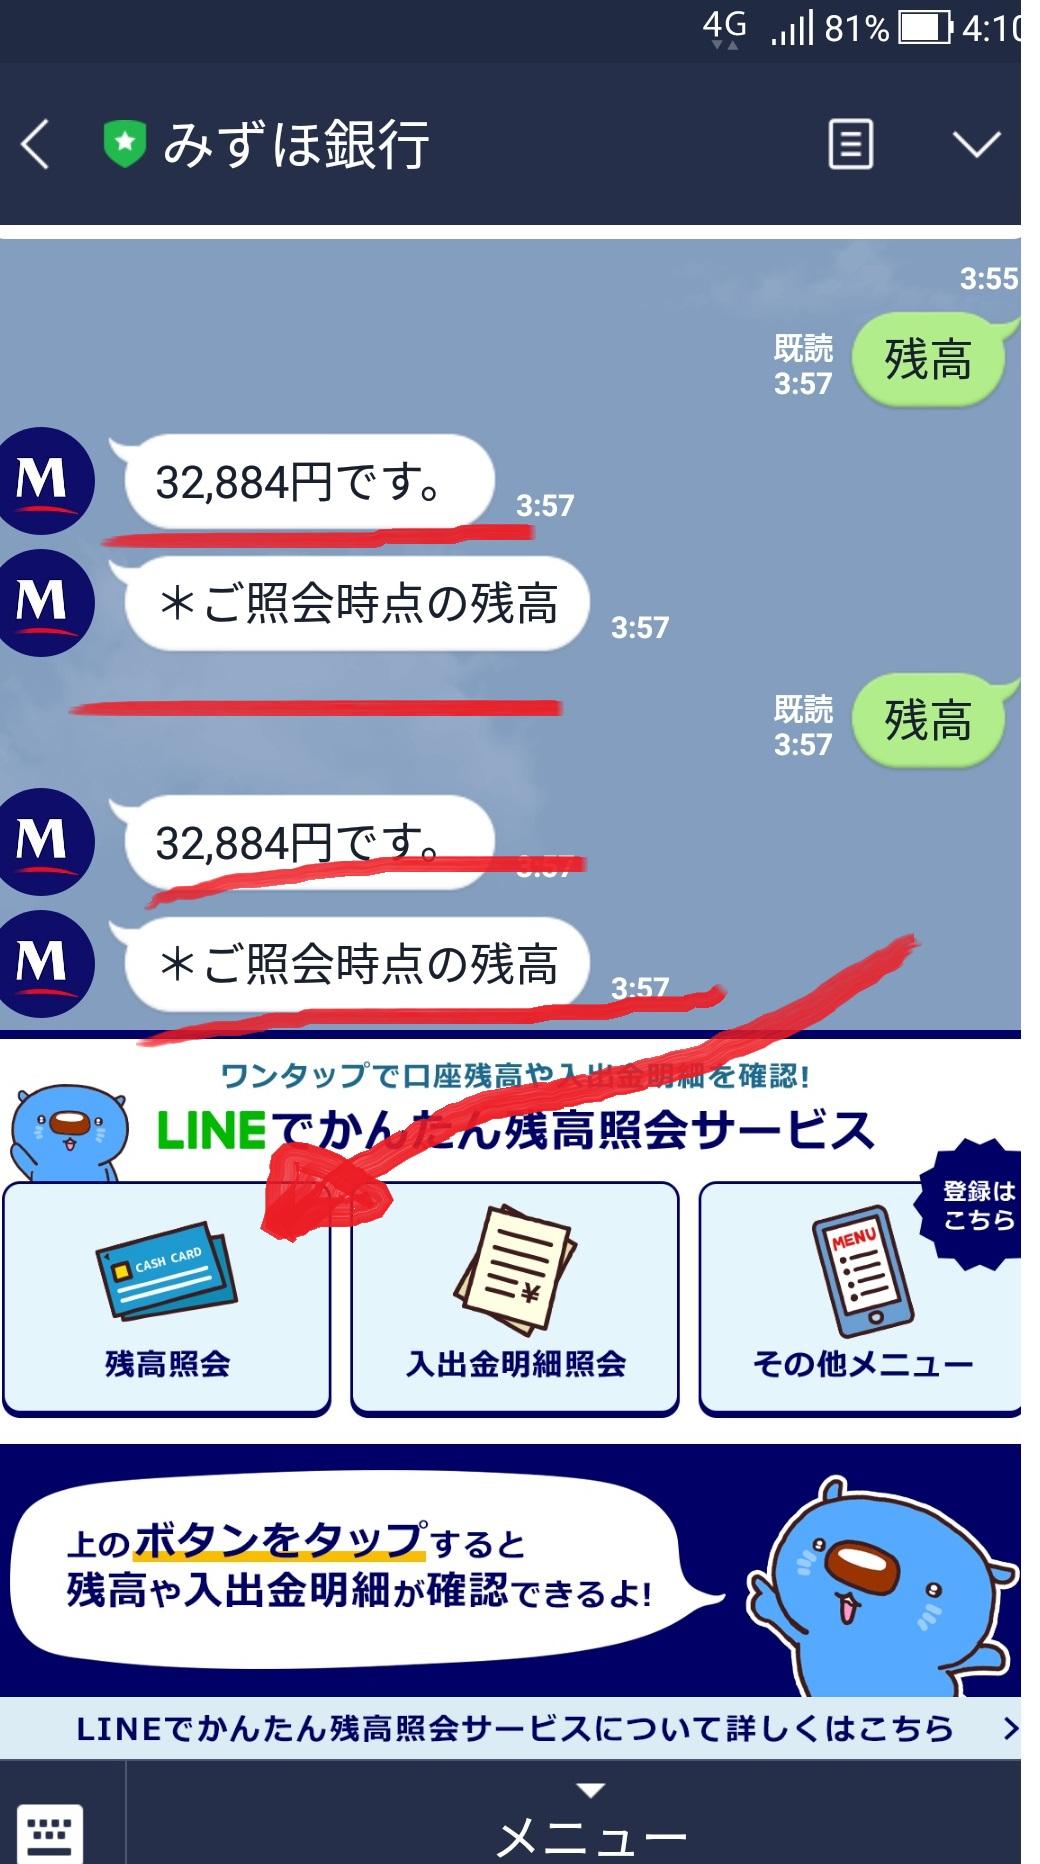 mizuho_zandaka_LINE.jpg